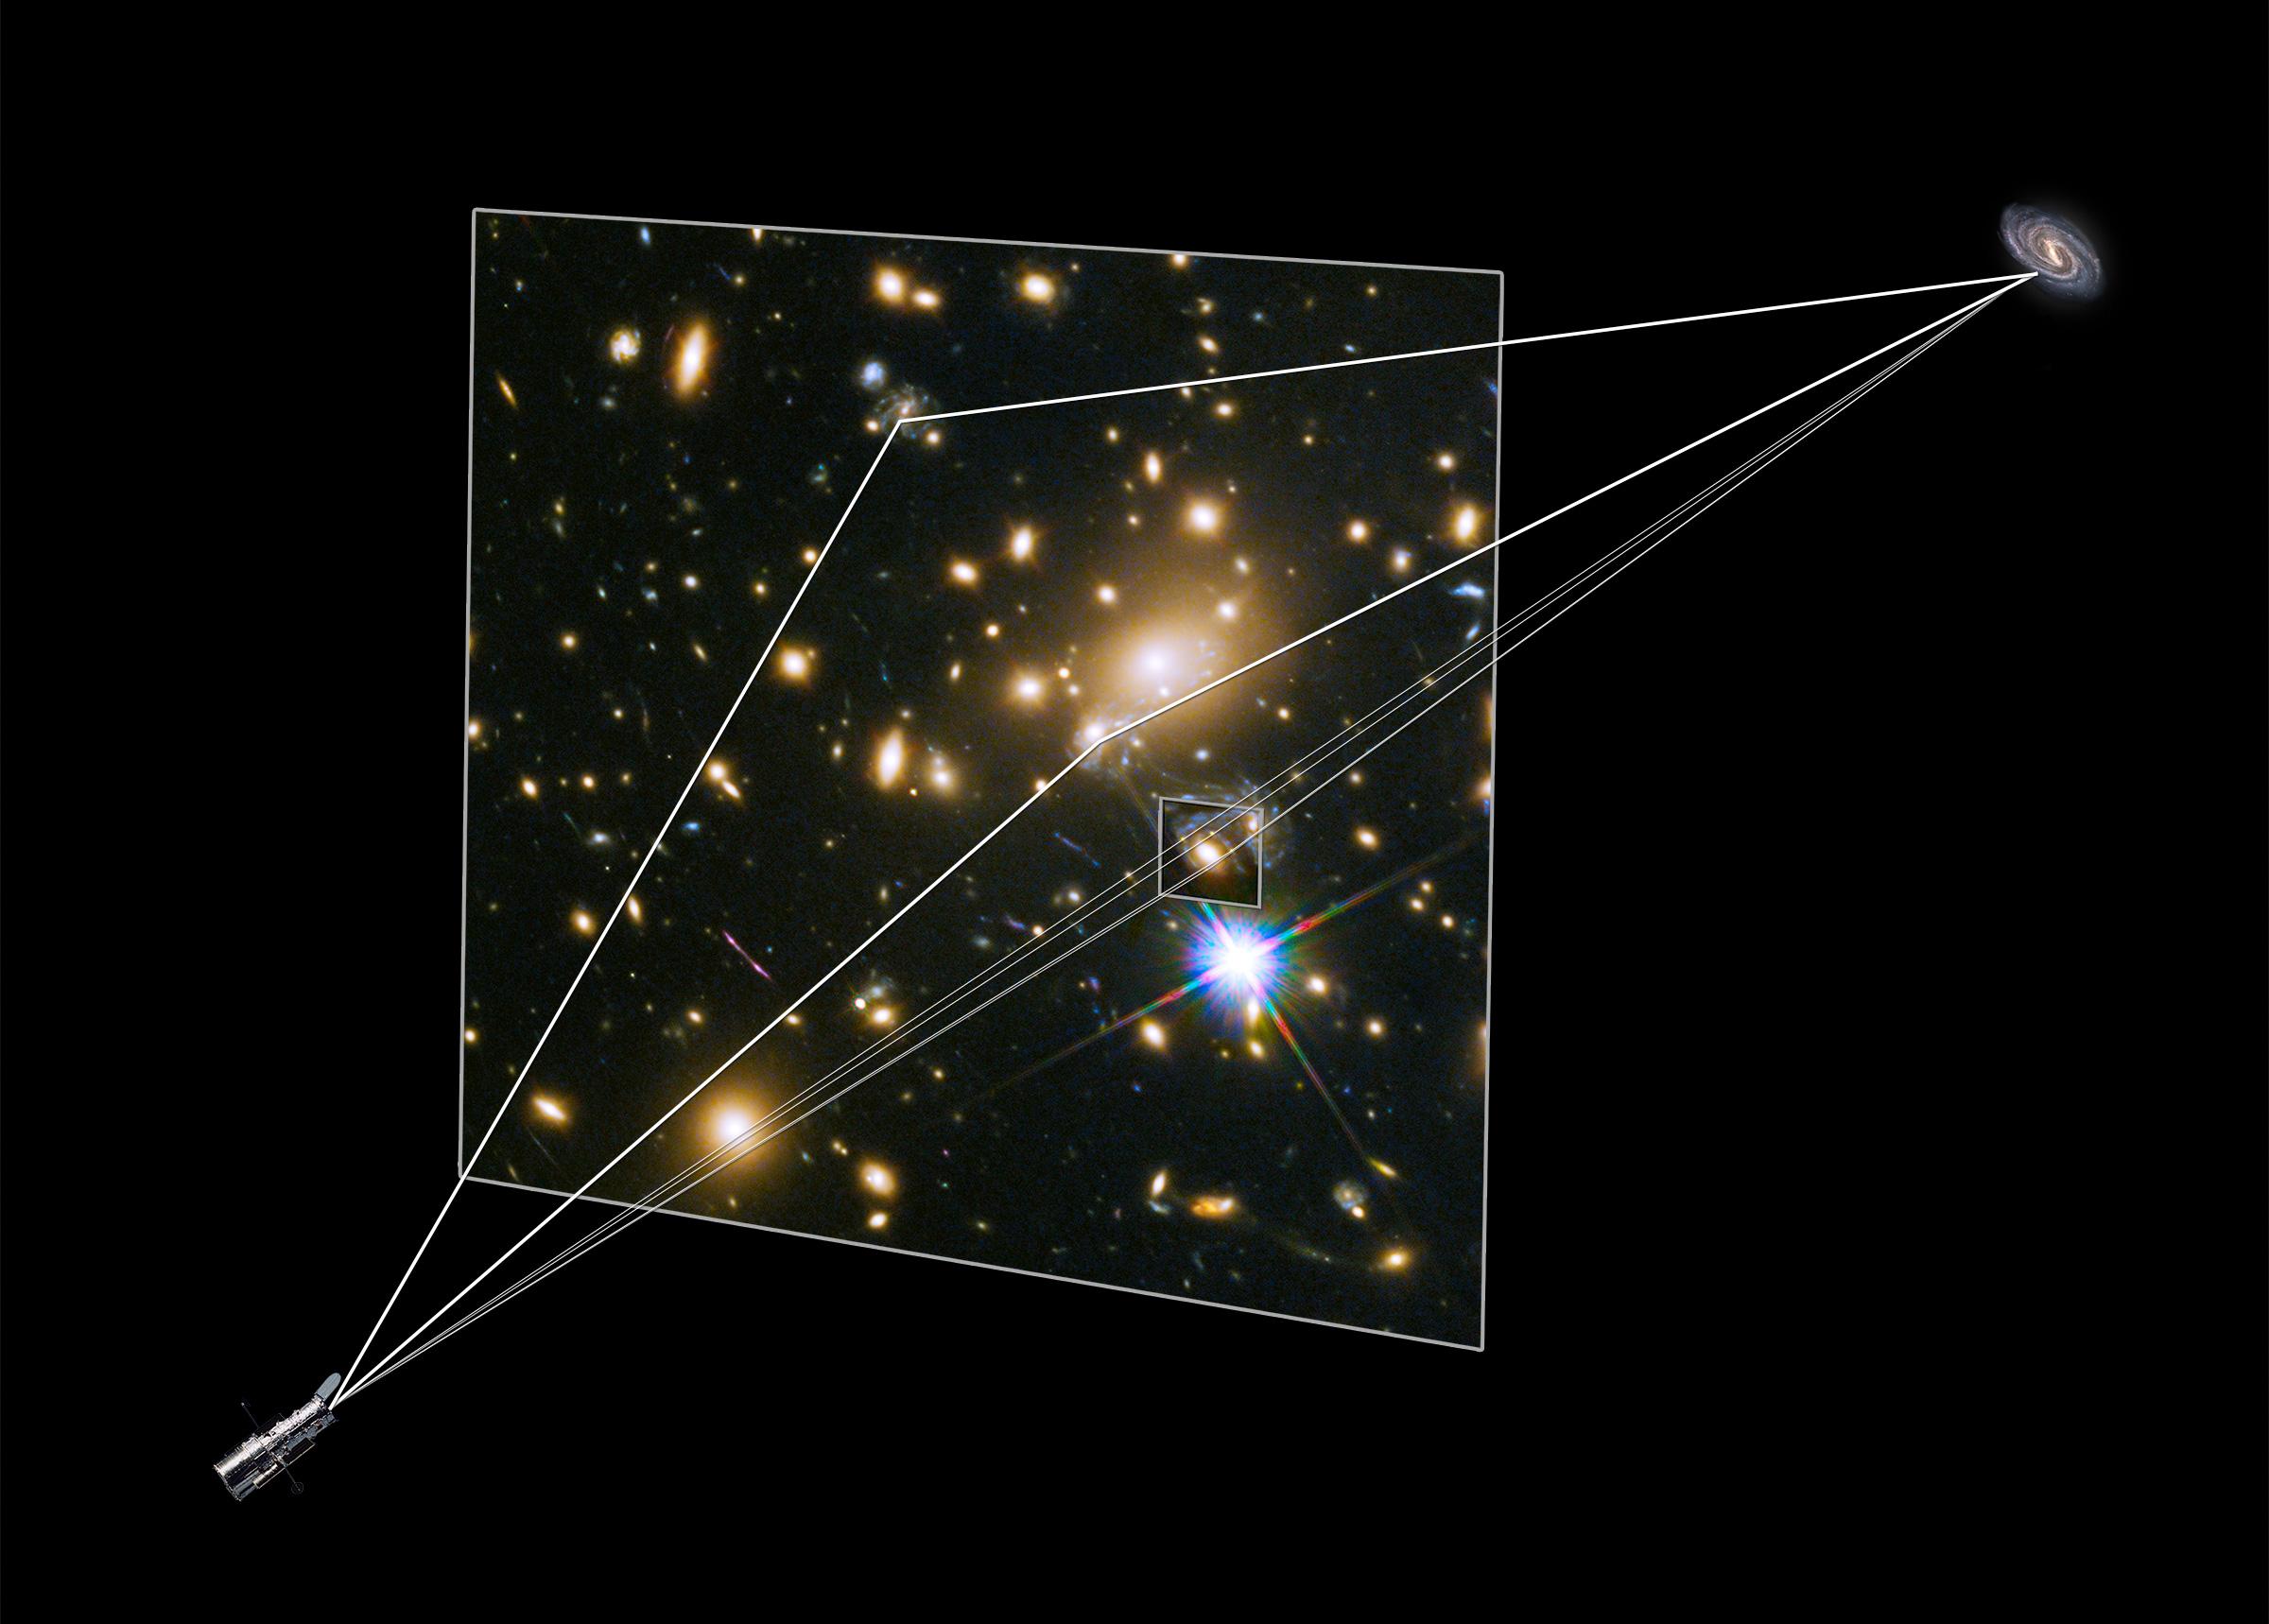 1567215441487-heic1525c.jpg